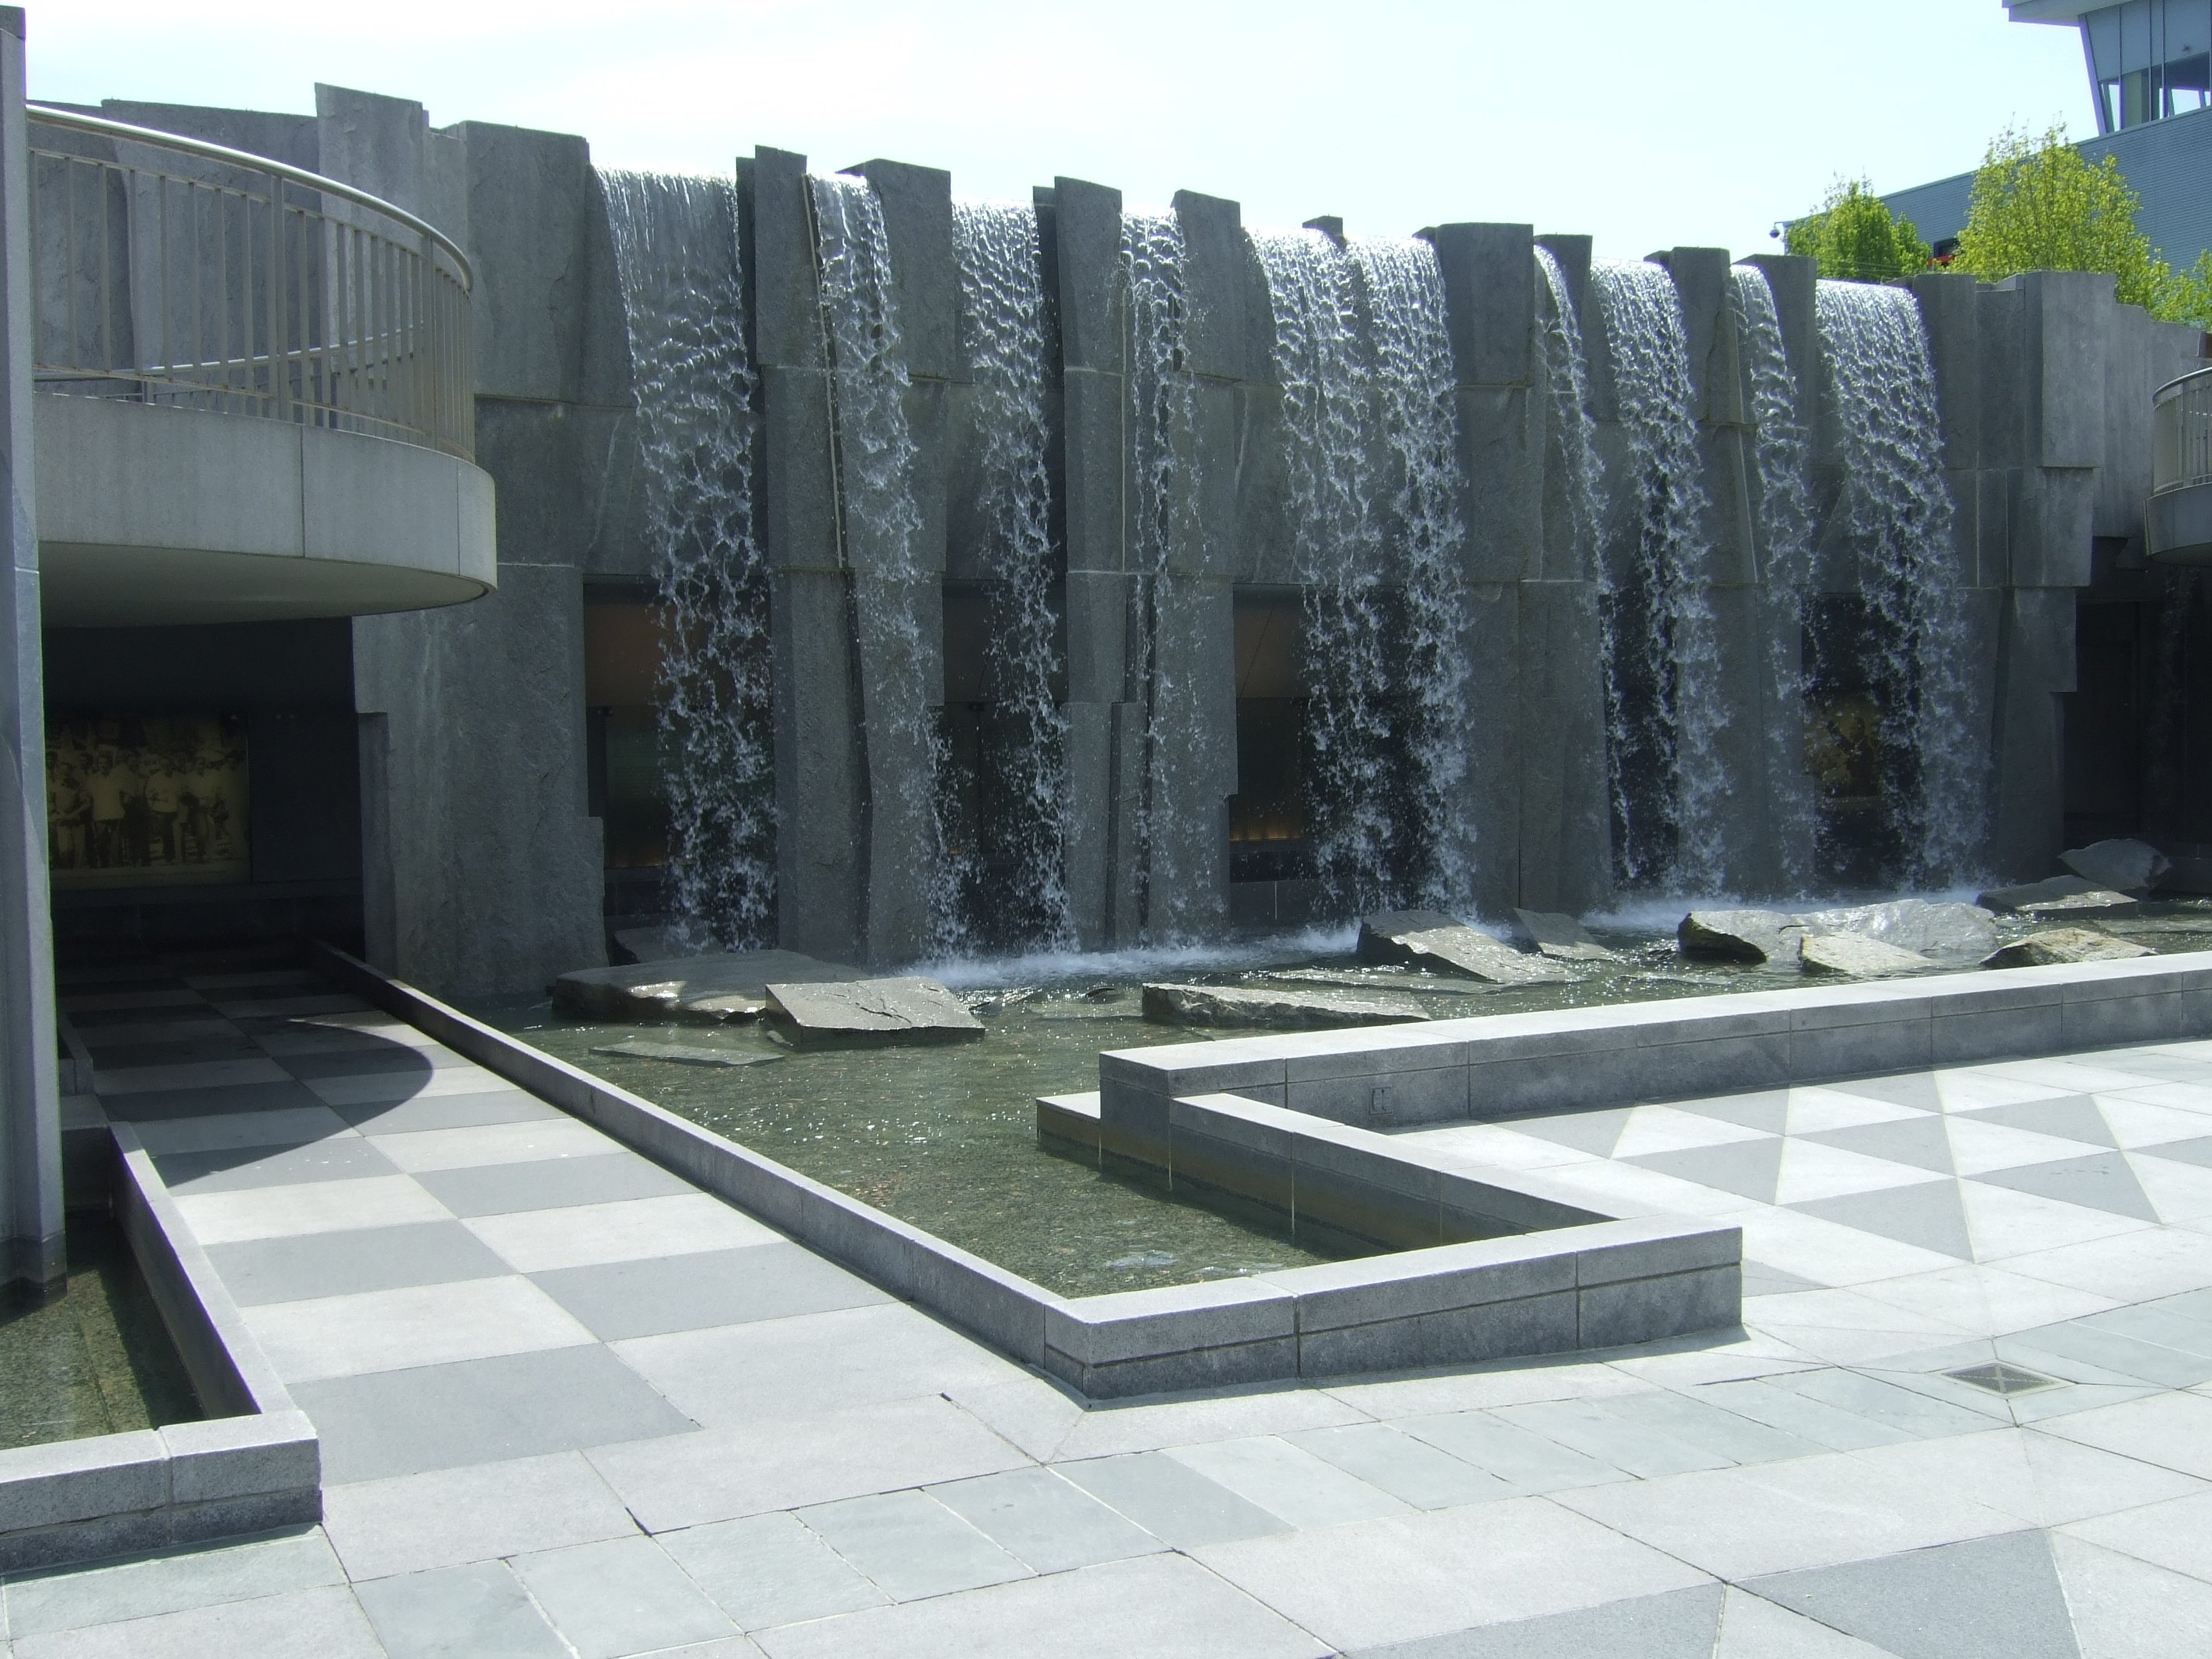 file san francisco yerba buena gardens wikimedia commons